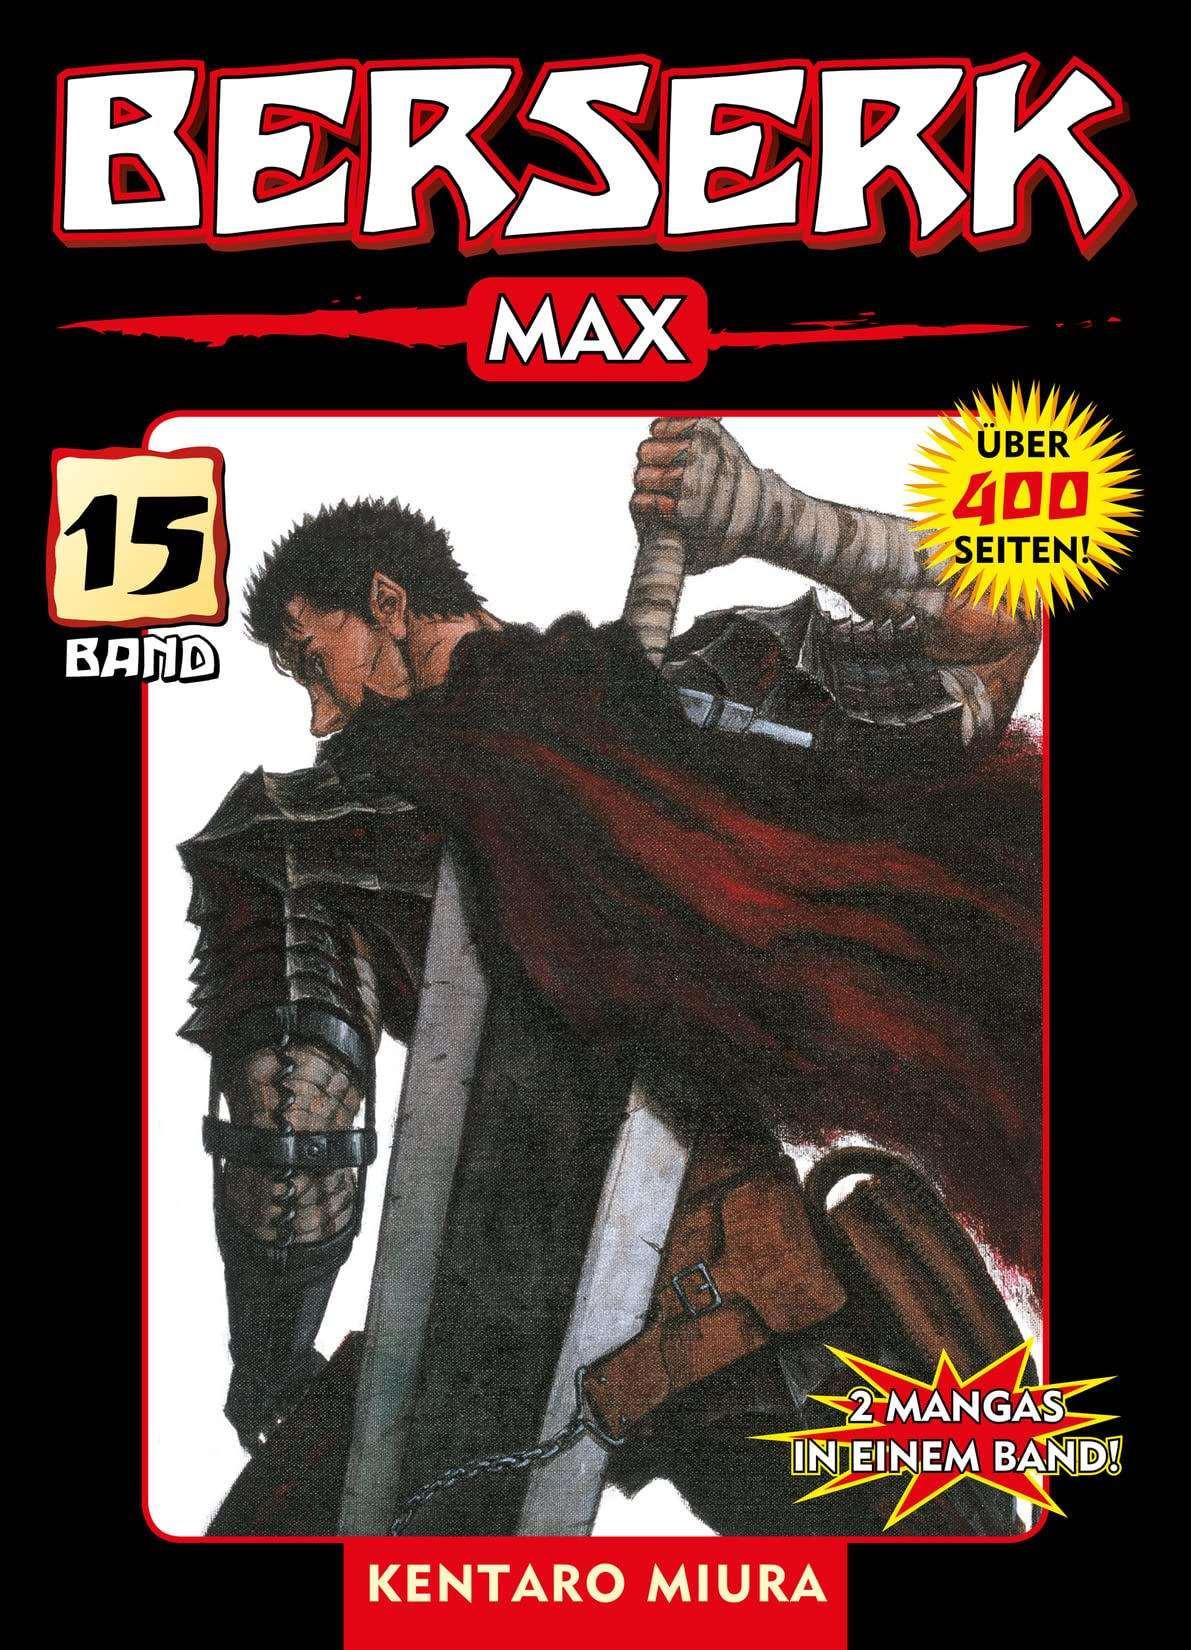 Berserk Max Vol. 15